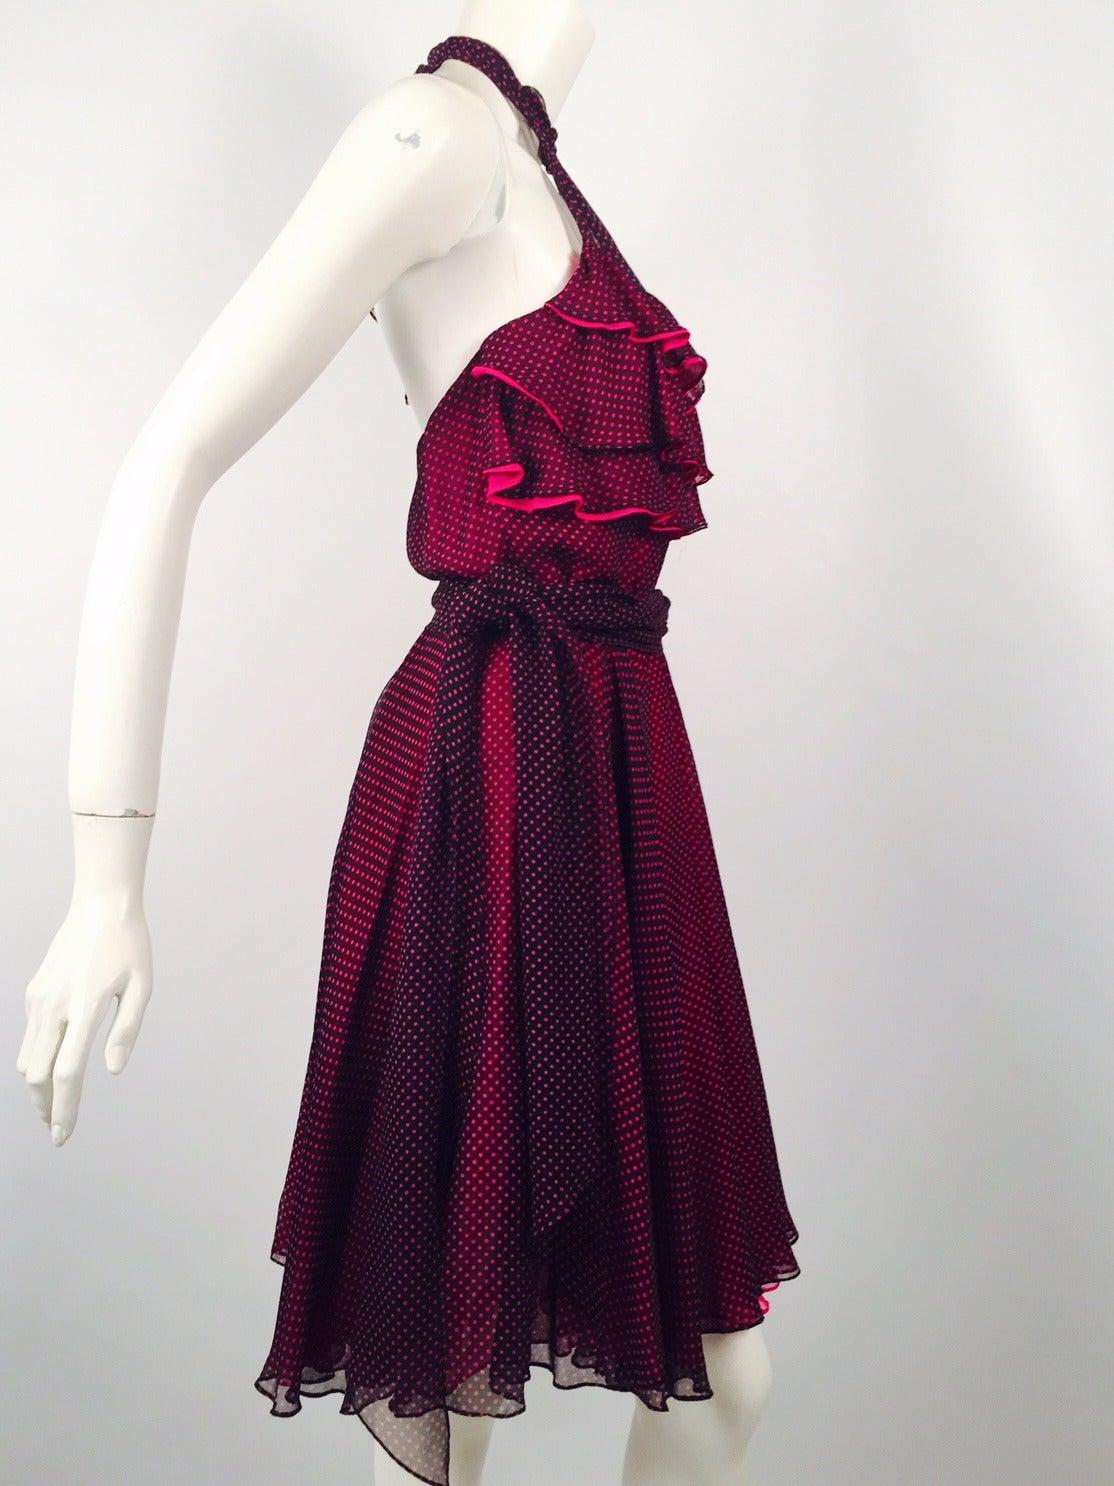 New 100% Silk Fiandaca Fuschia and Black Polka Dot Halter Dress In New never worn Condition For Sale In Palm Beach, FL